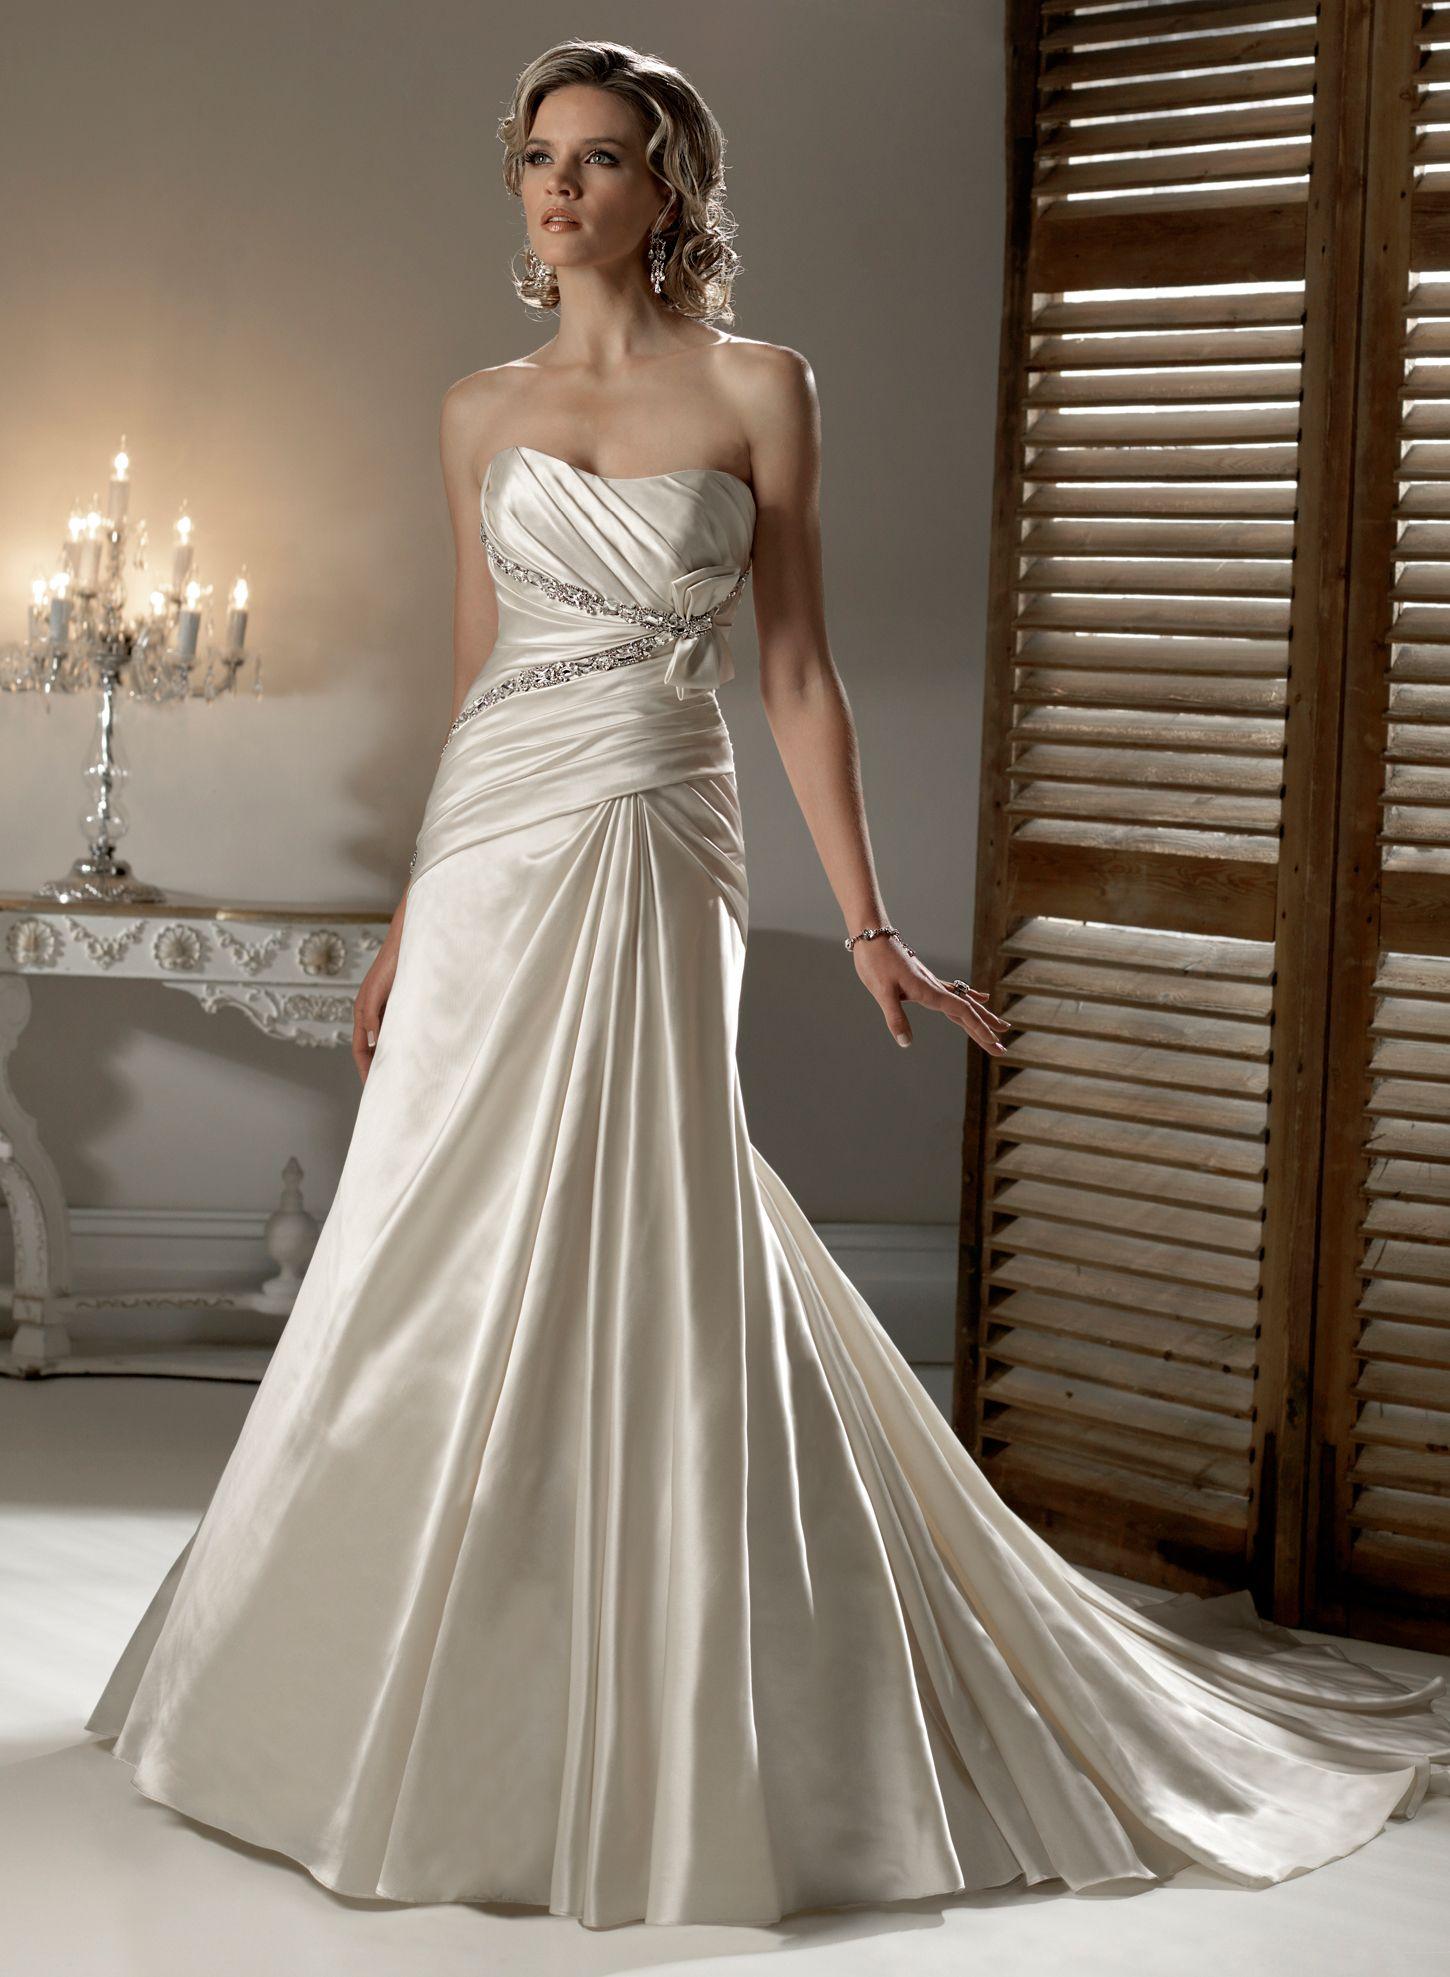 Maggie Sottero Wedding Dresses Wedding Dress Necklines Wedding Dresses Wedding Dress Styles